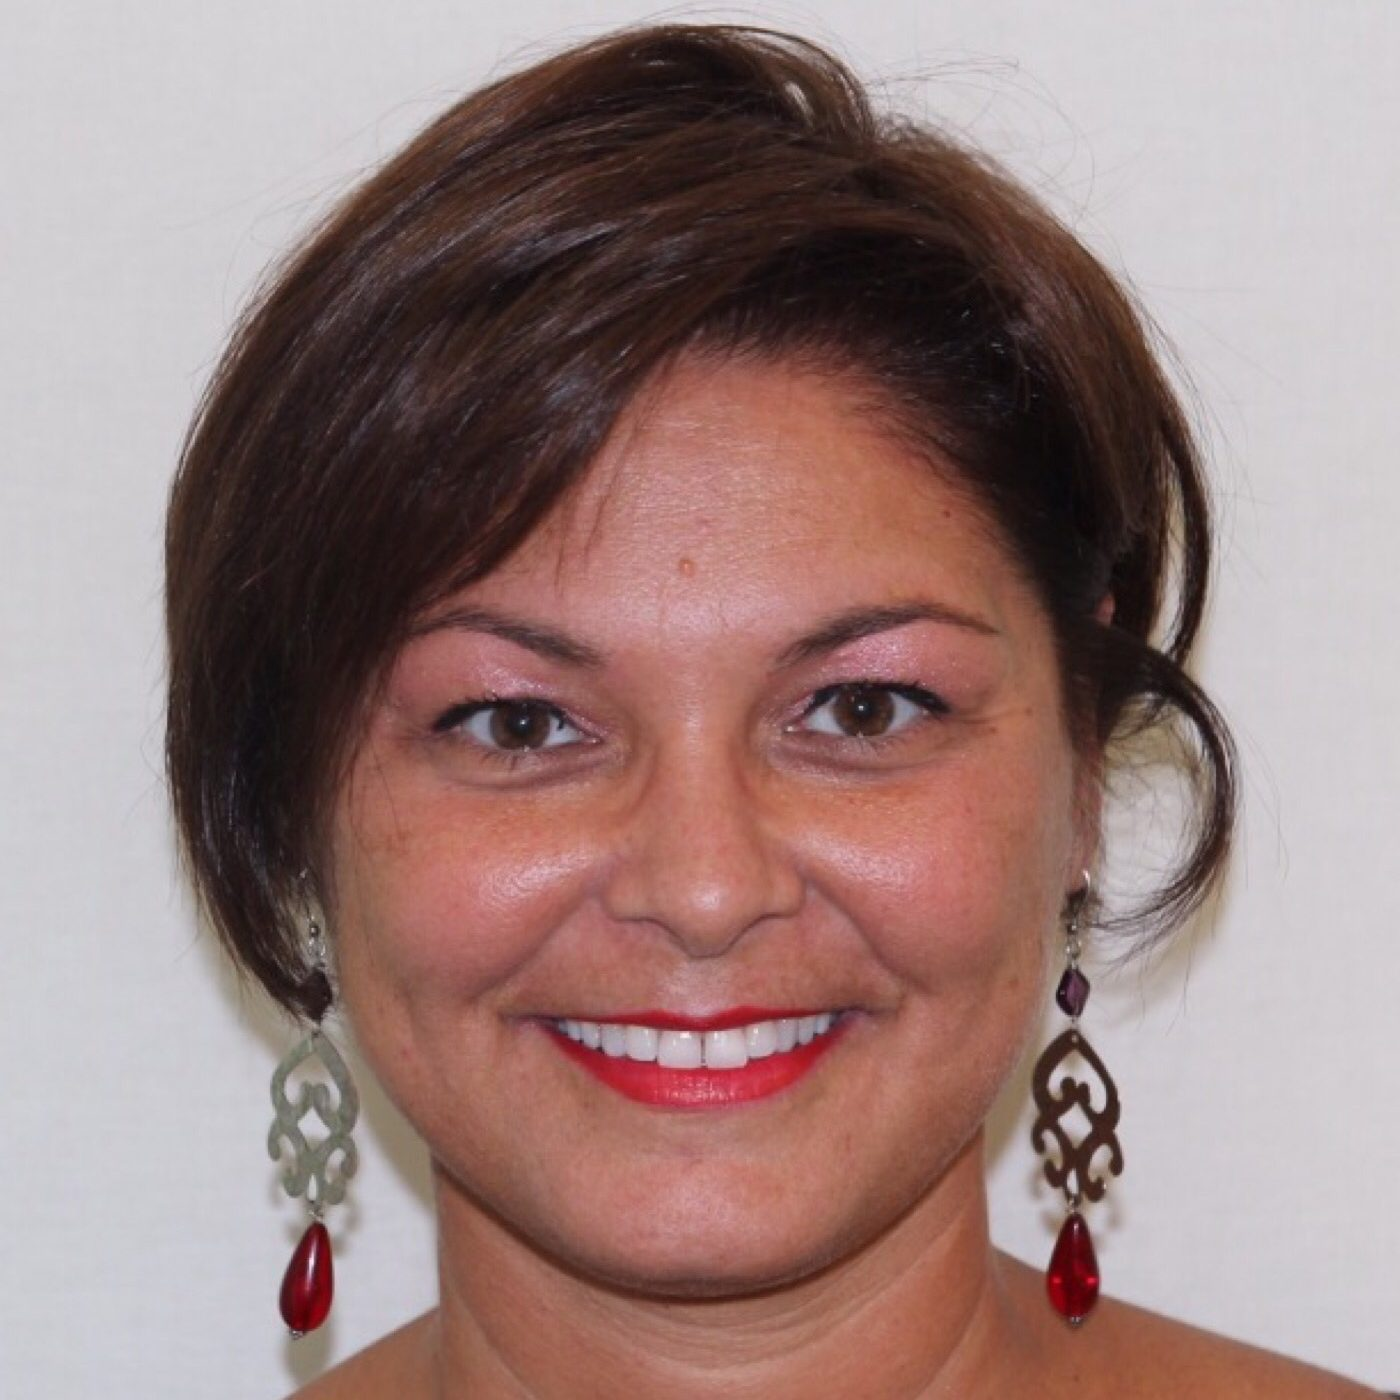 Dott.ssa Eleonora Saladino